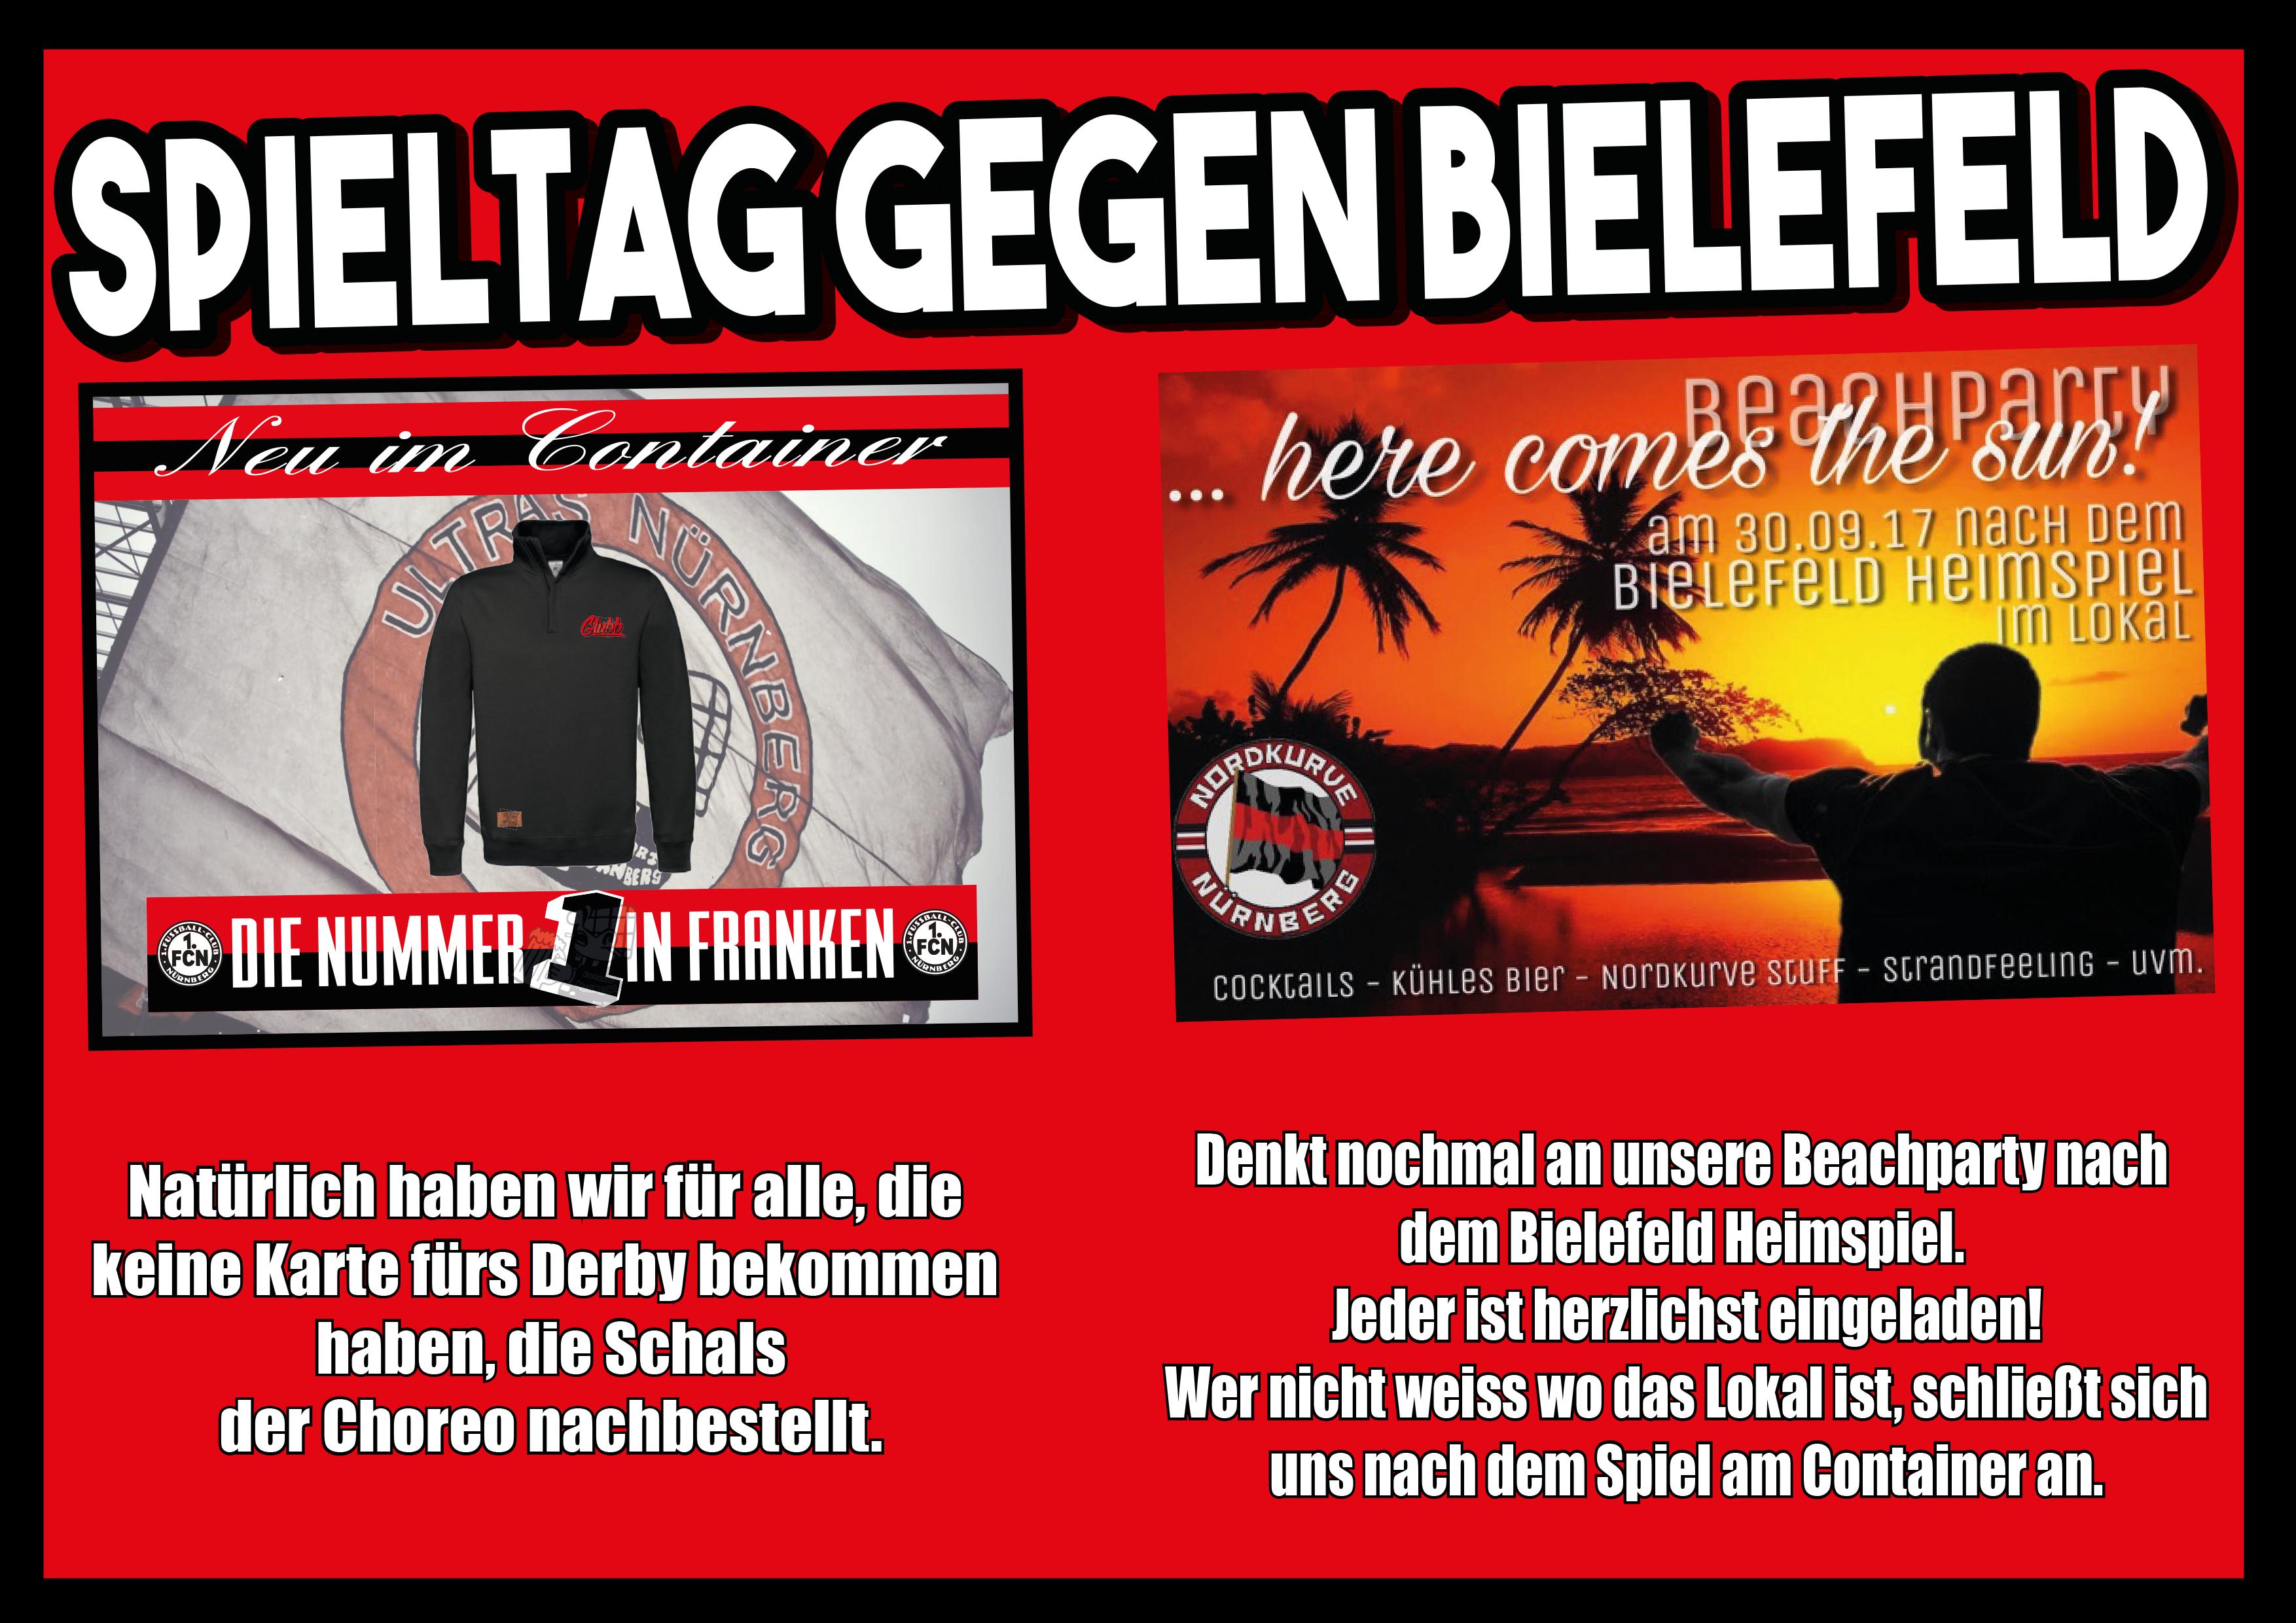 Bielefeld Heimspiel